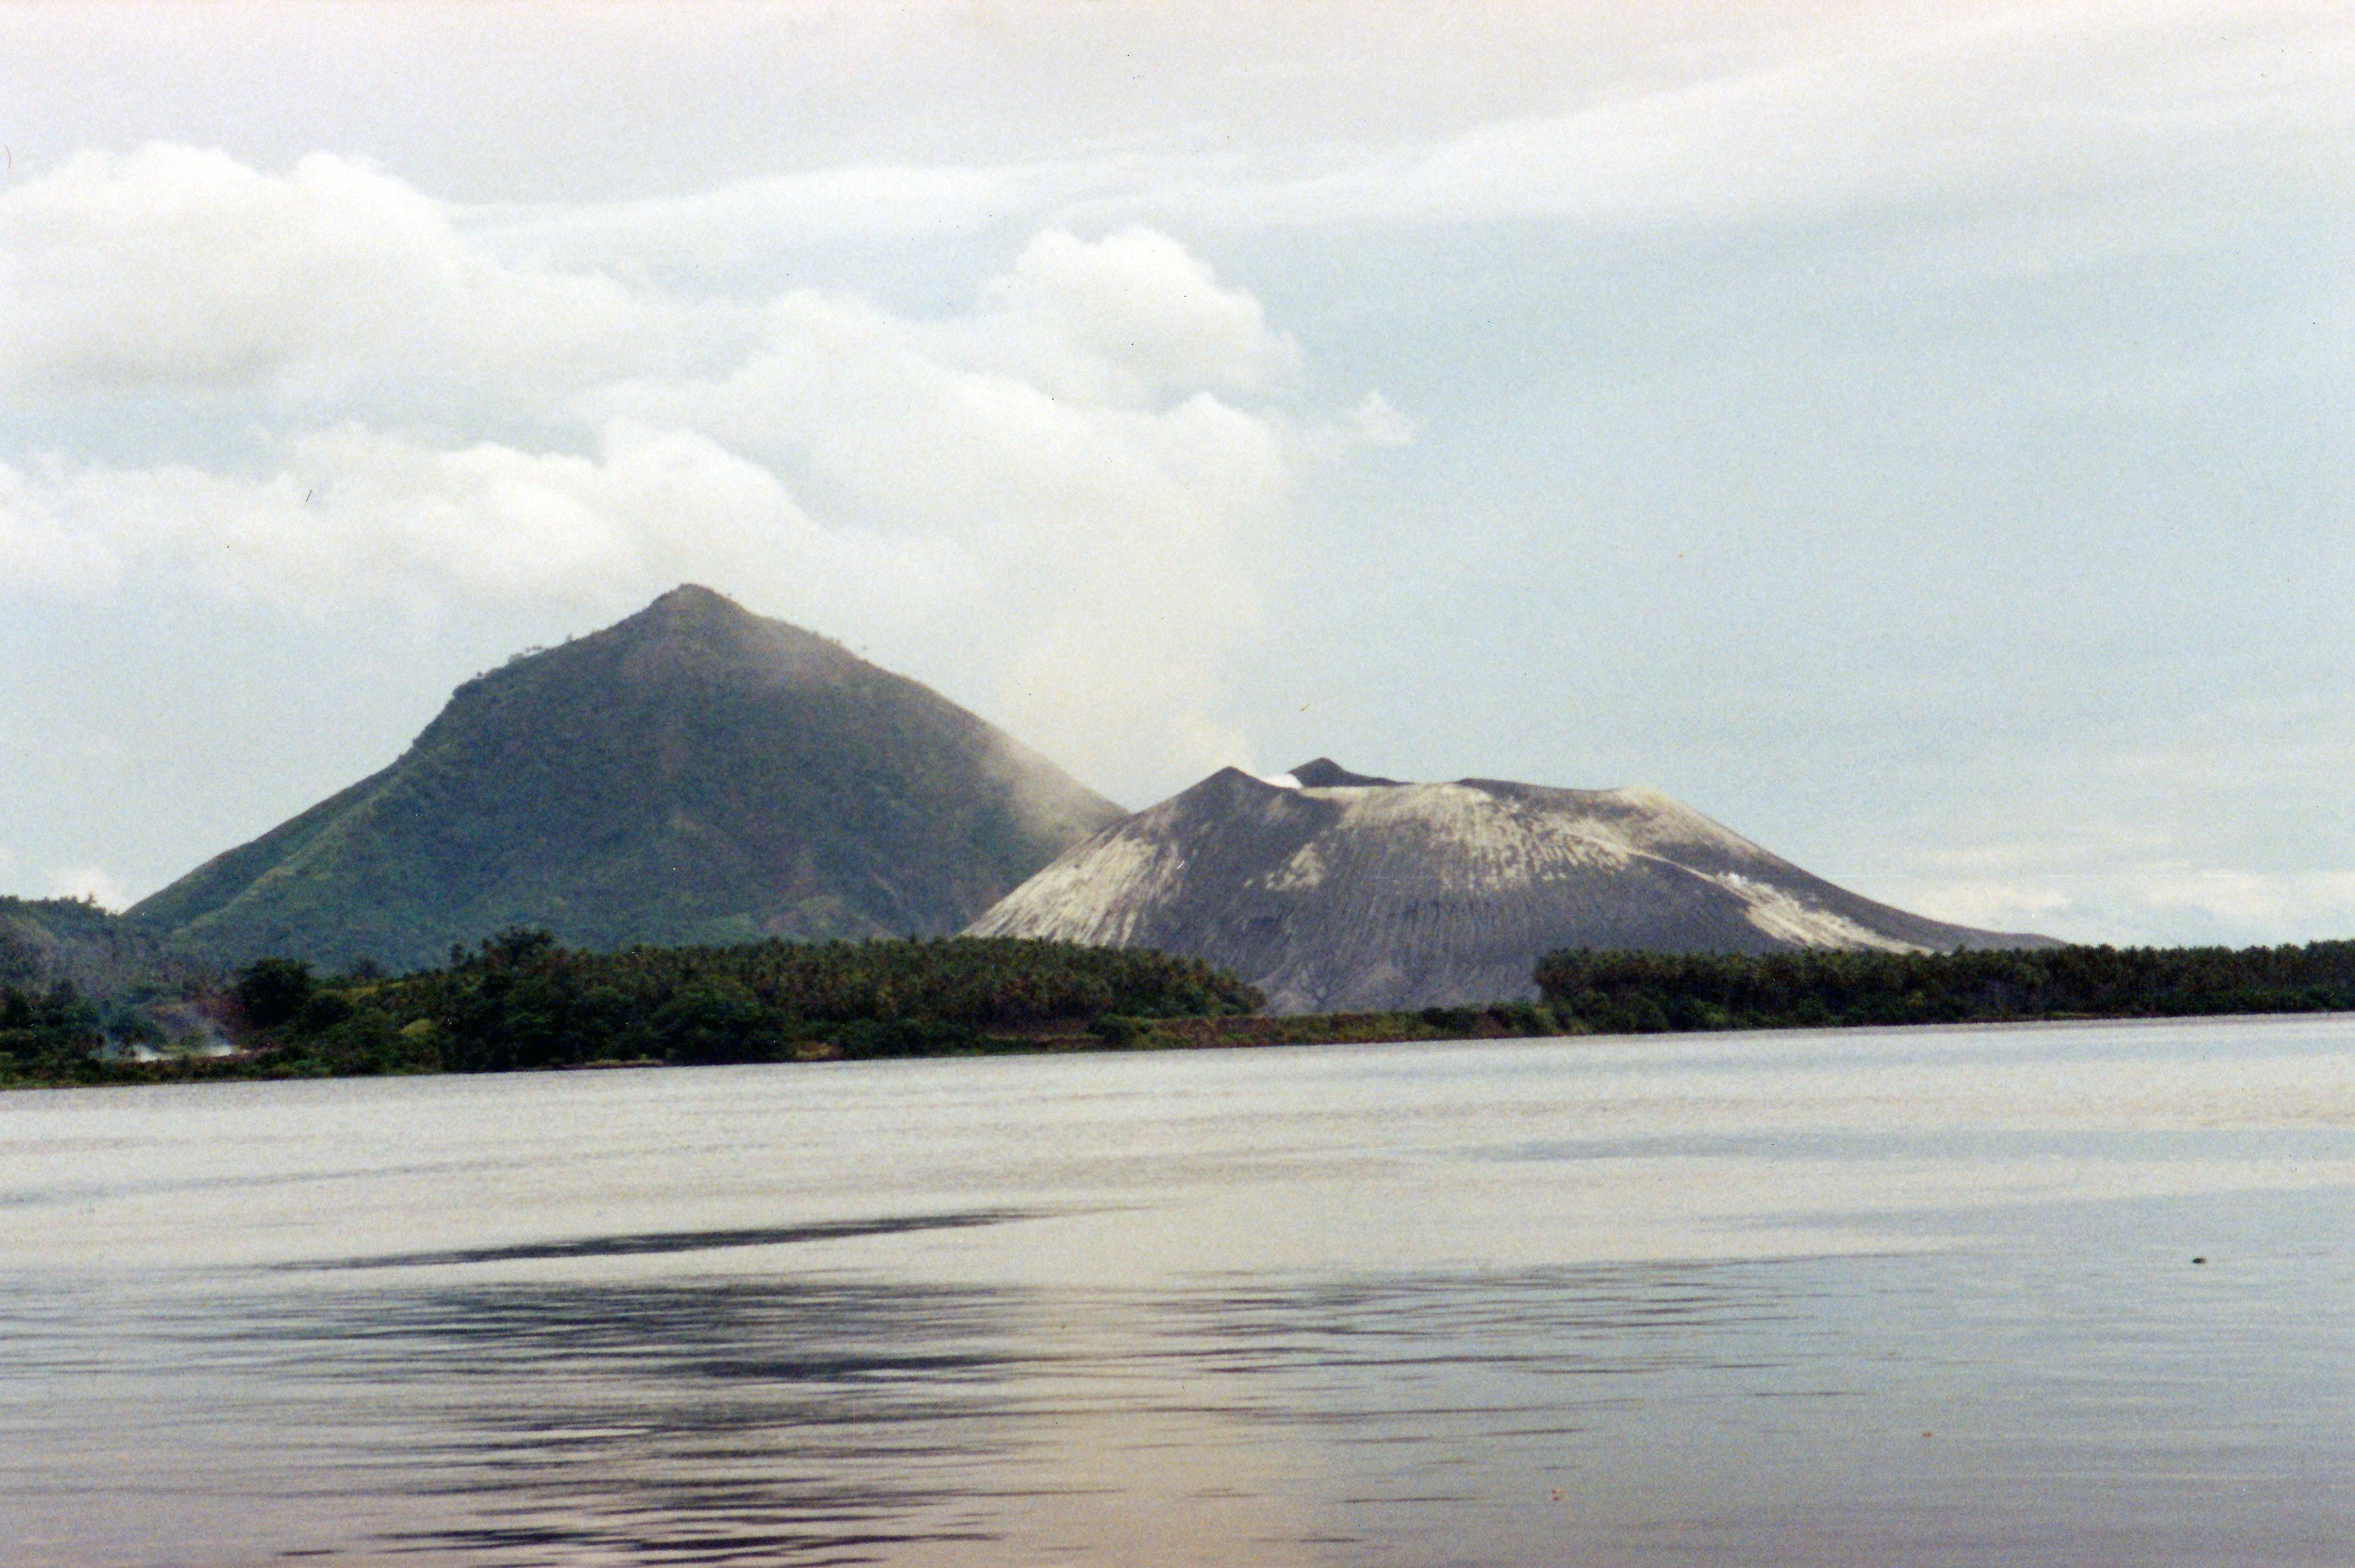 Rabaul_volcanos_2011